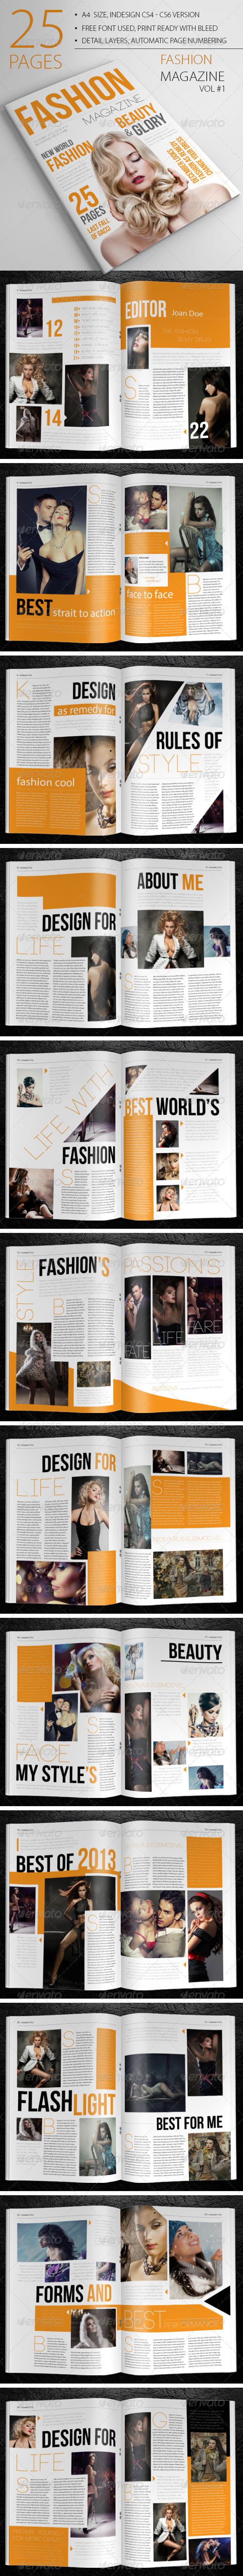 GraphicRiver 25 Pages Fashion Magazine Vol1 6583230